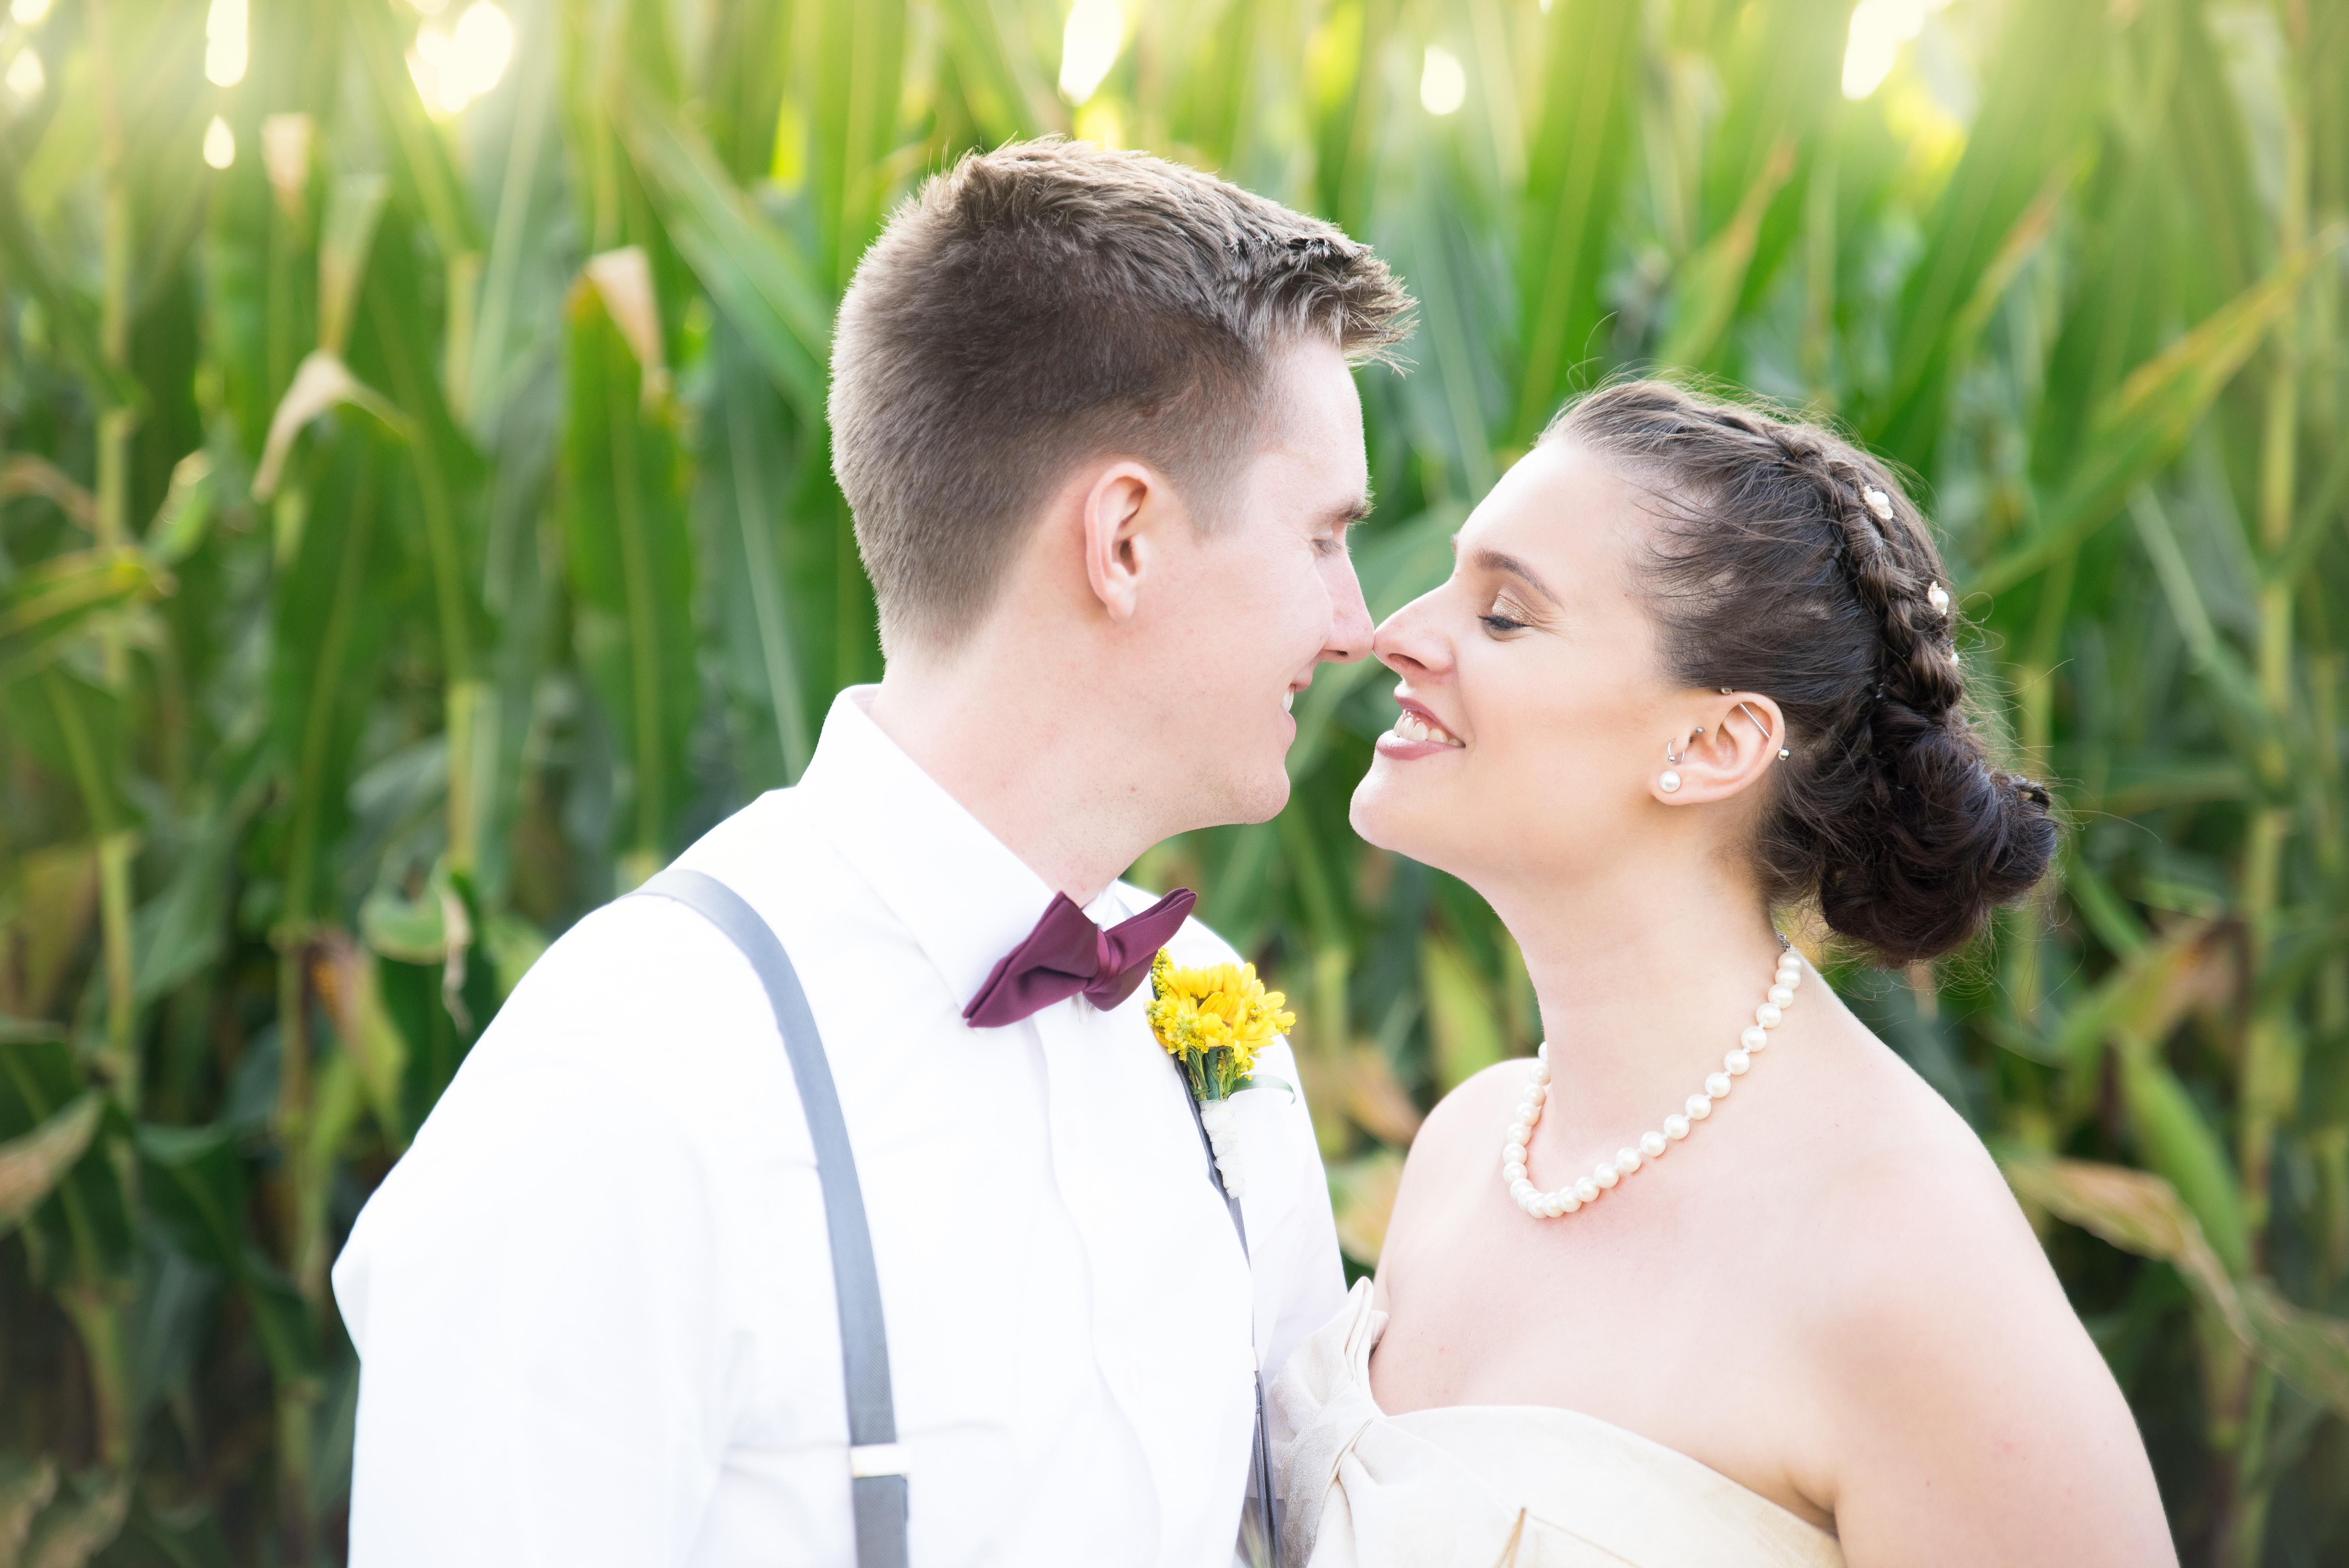 Sam & Colin's Wedding Image